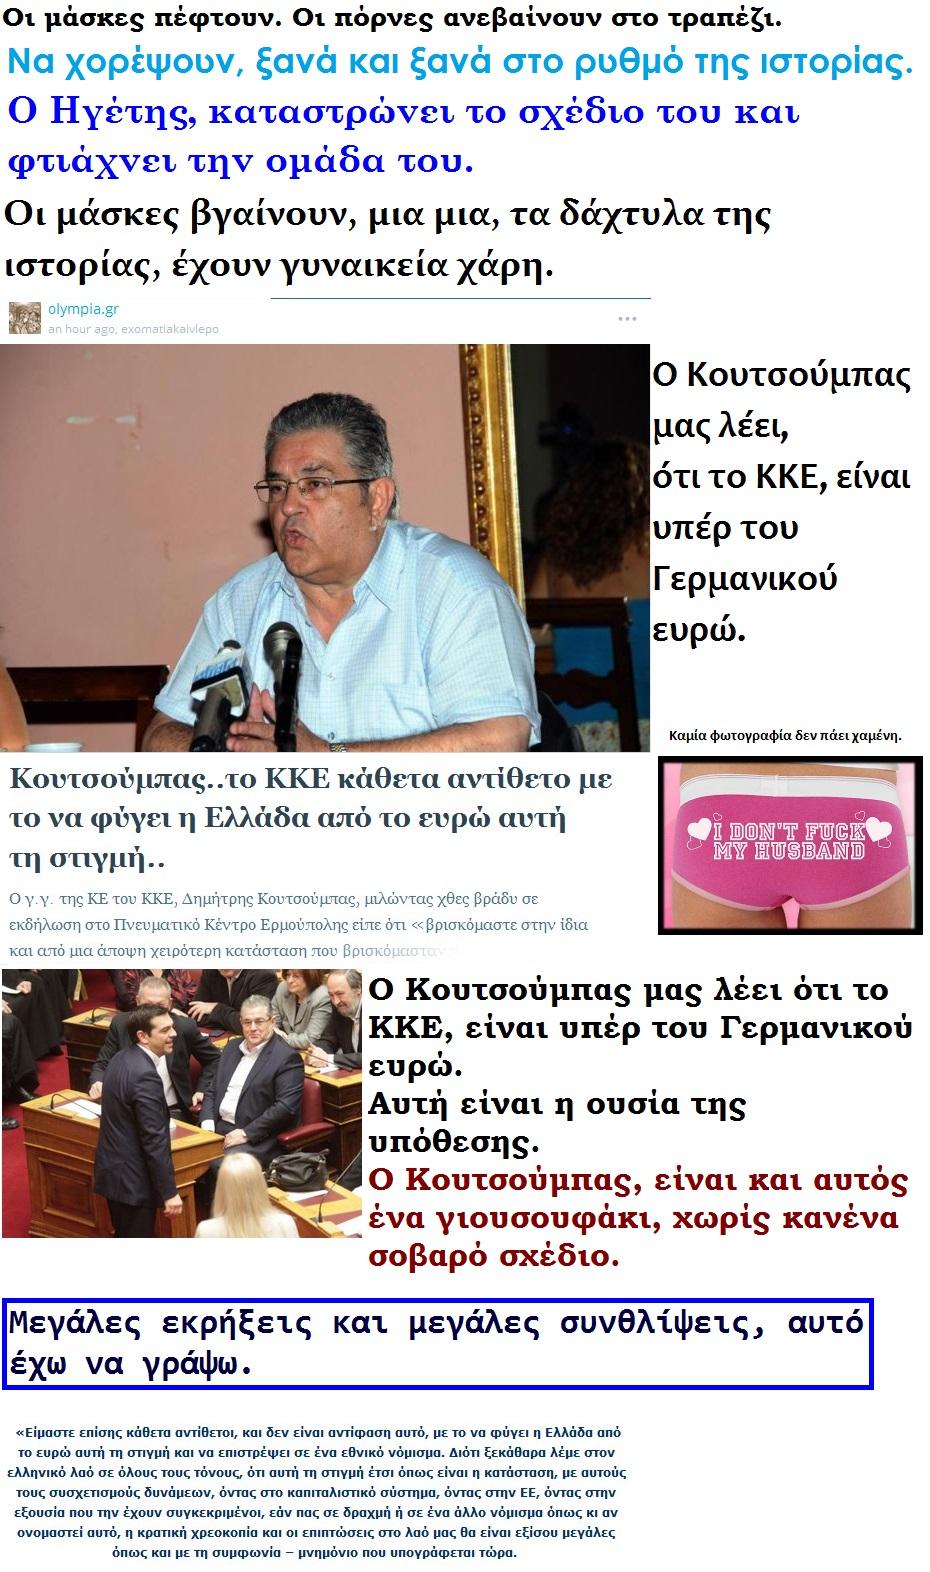 ELLADA KOUTSOUMPAS DHMHTRHS KKE YPER EURO MNHMONIO 3 01 260715 (1)